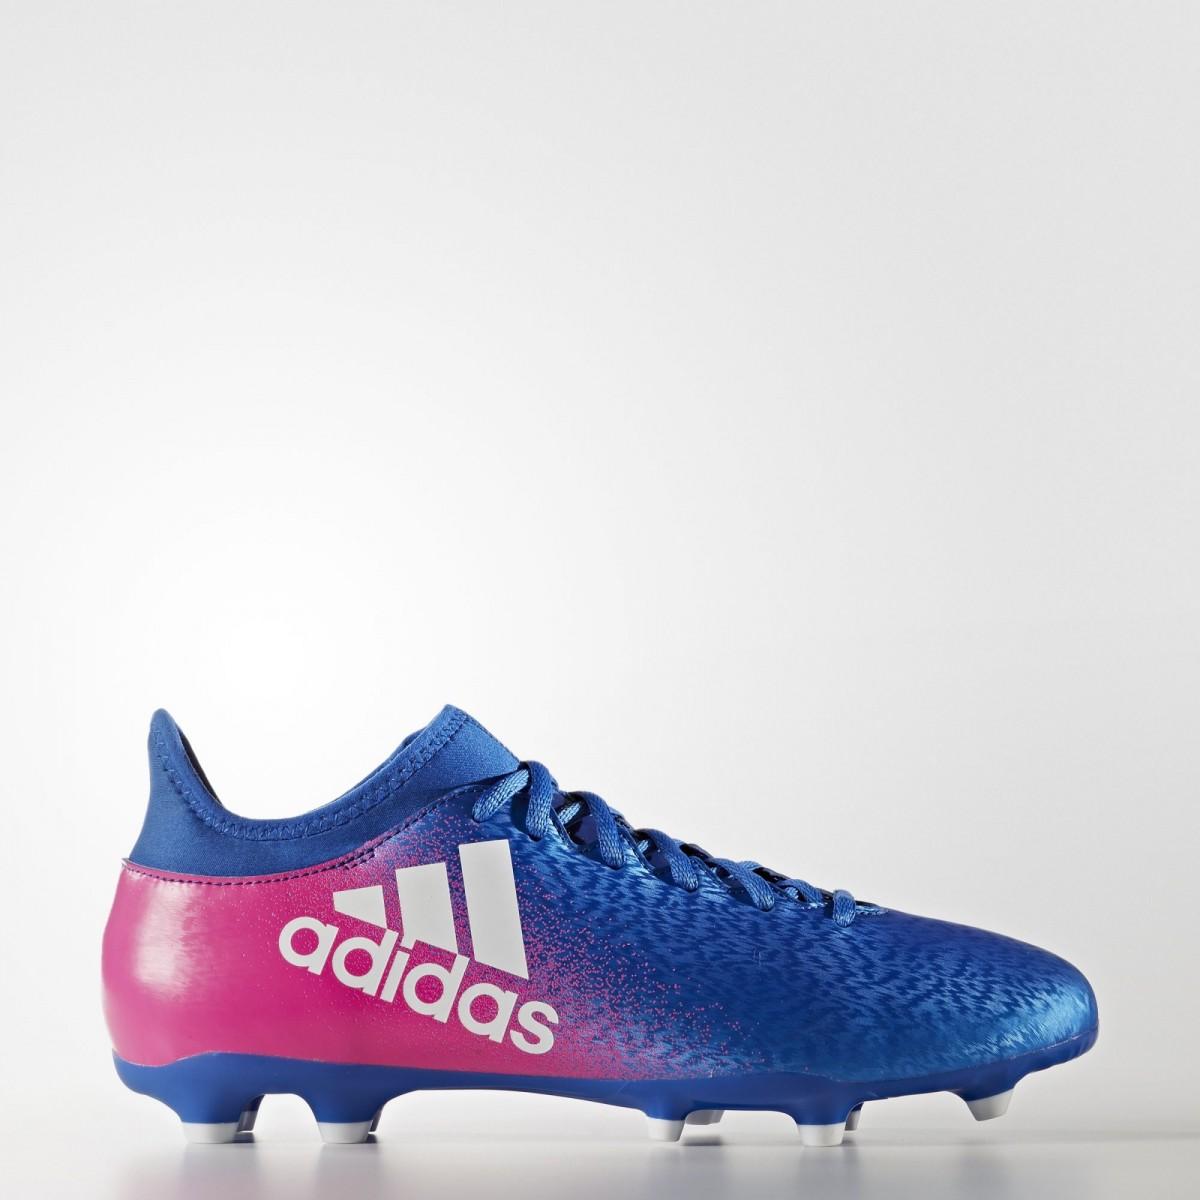 f174c51b5e Bizz Store - Chuteira Masculina Futebol de Campo Adidas X 16.3 FG